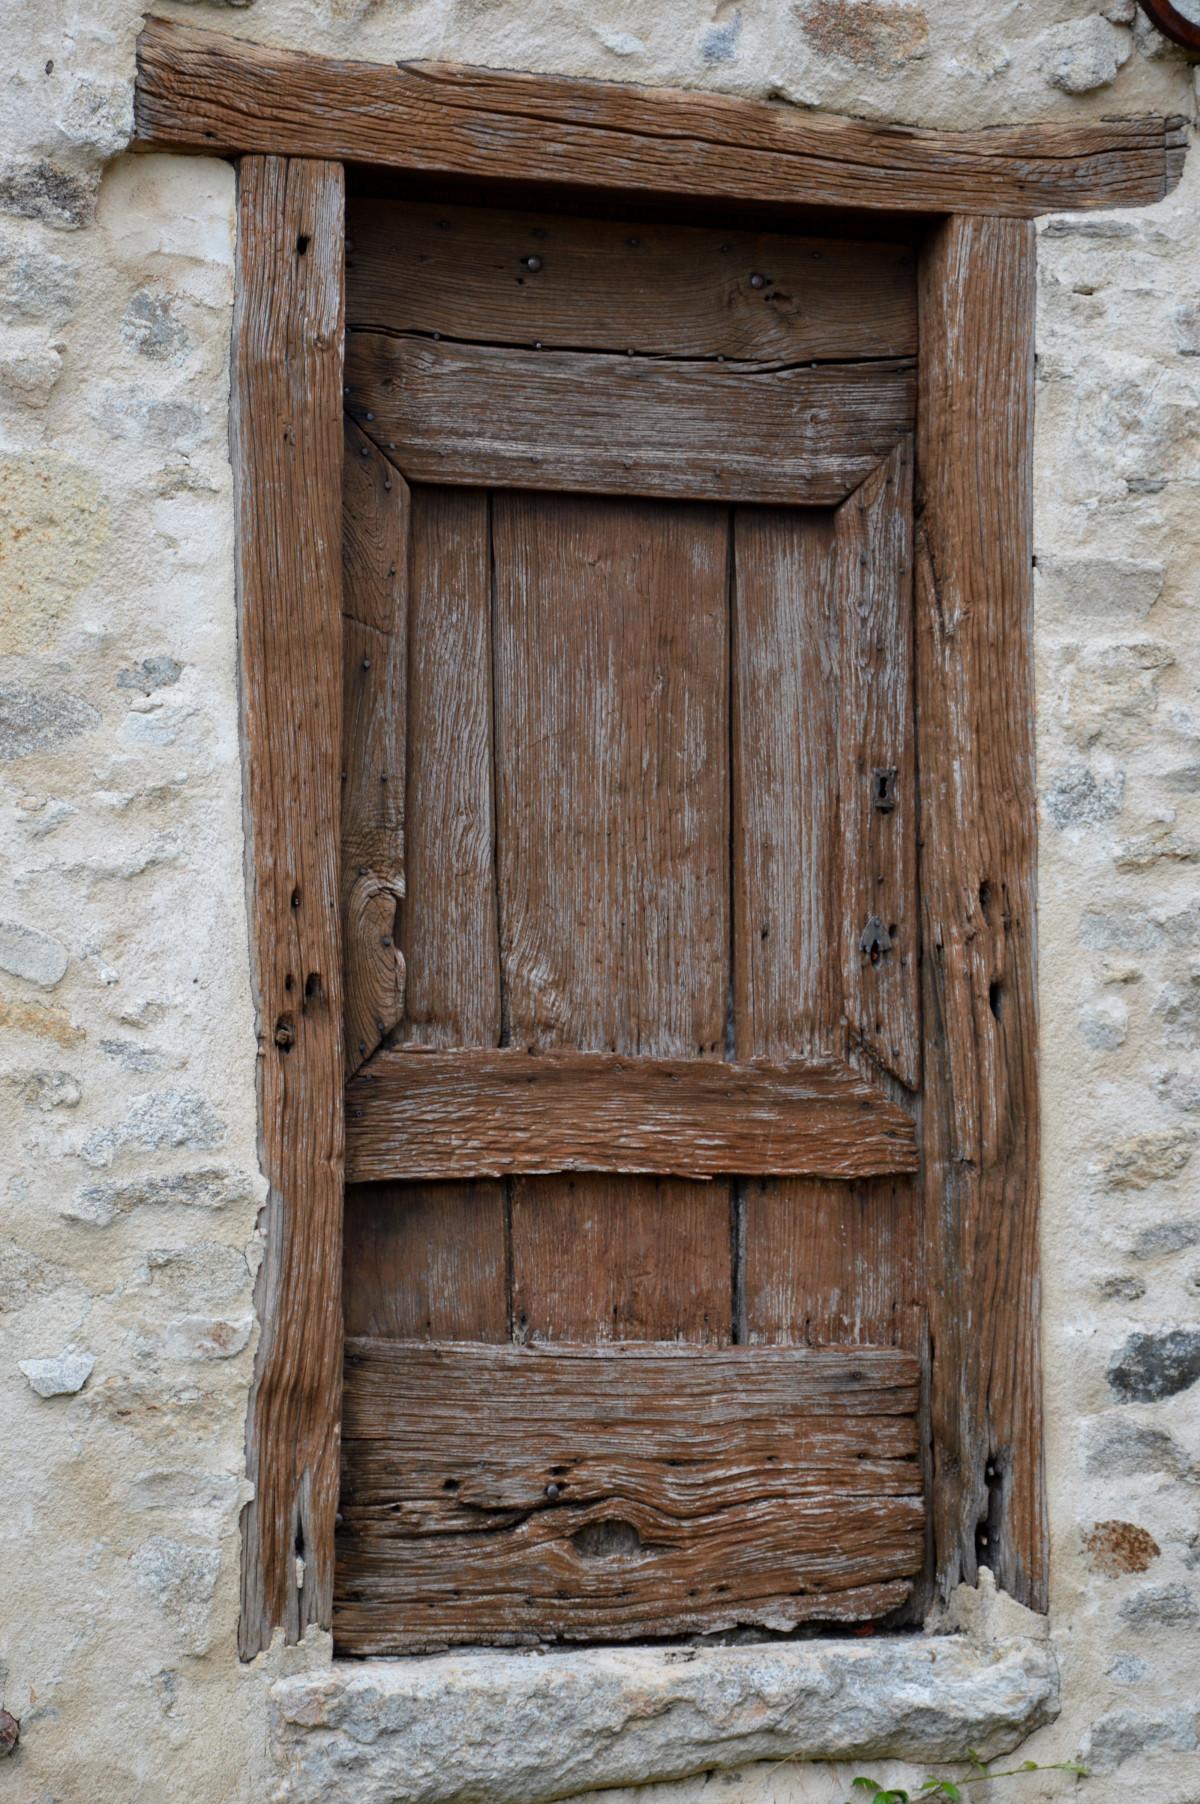 façade extérieure de maison